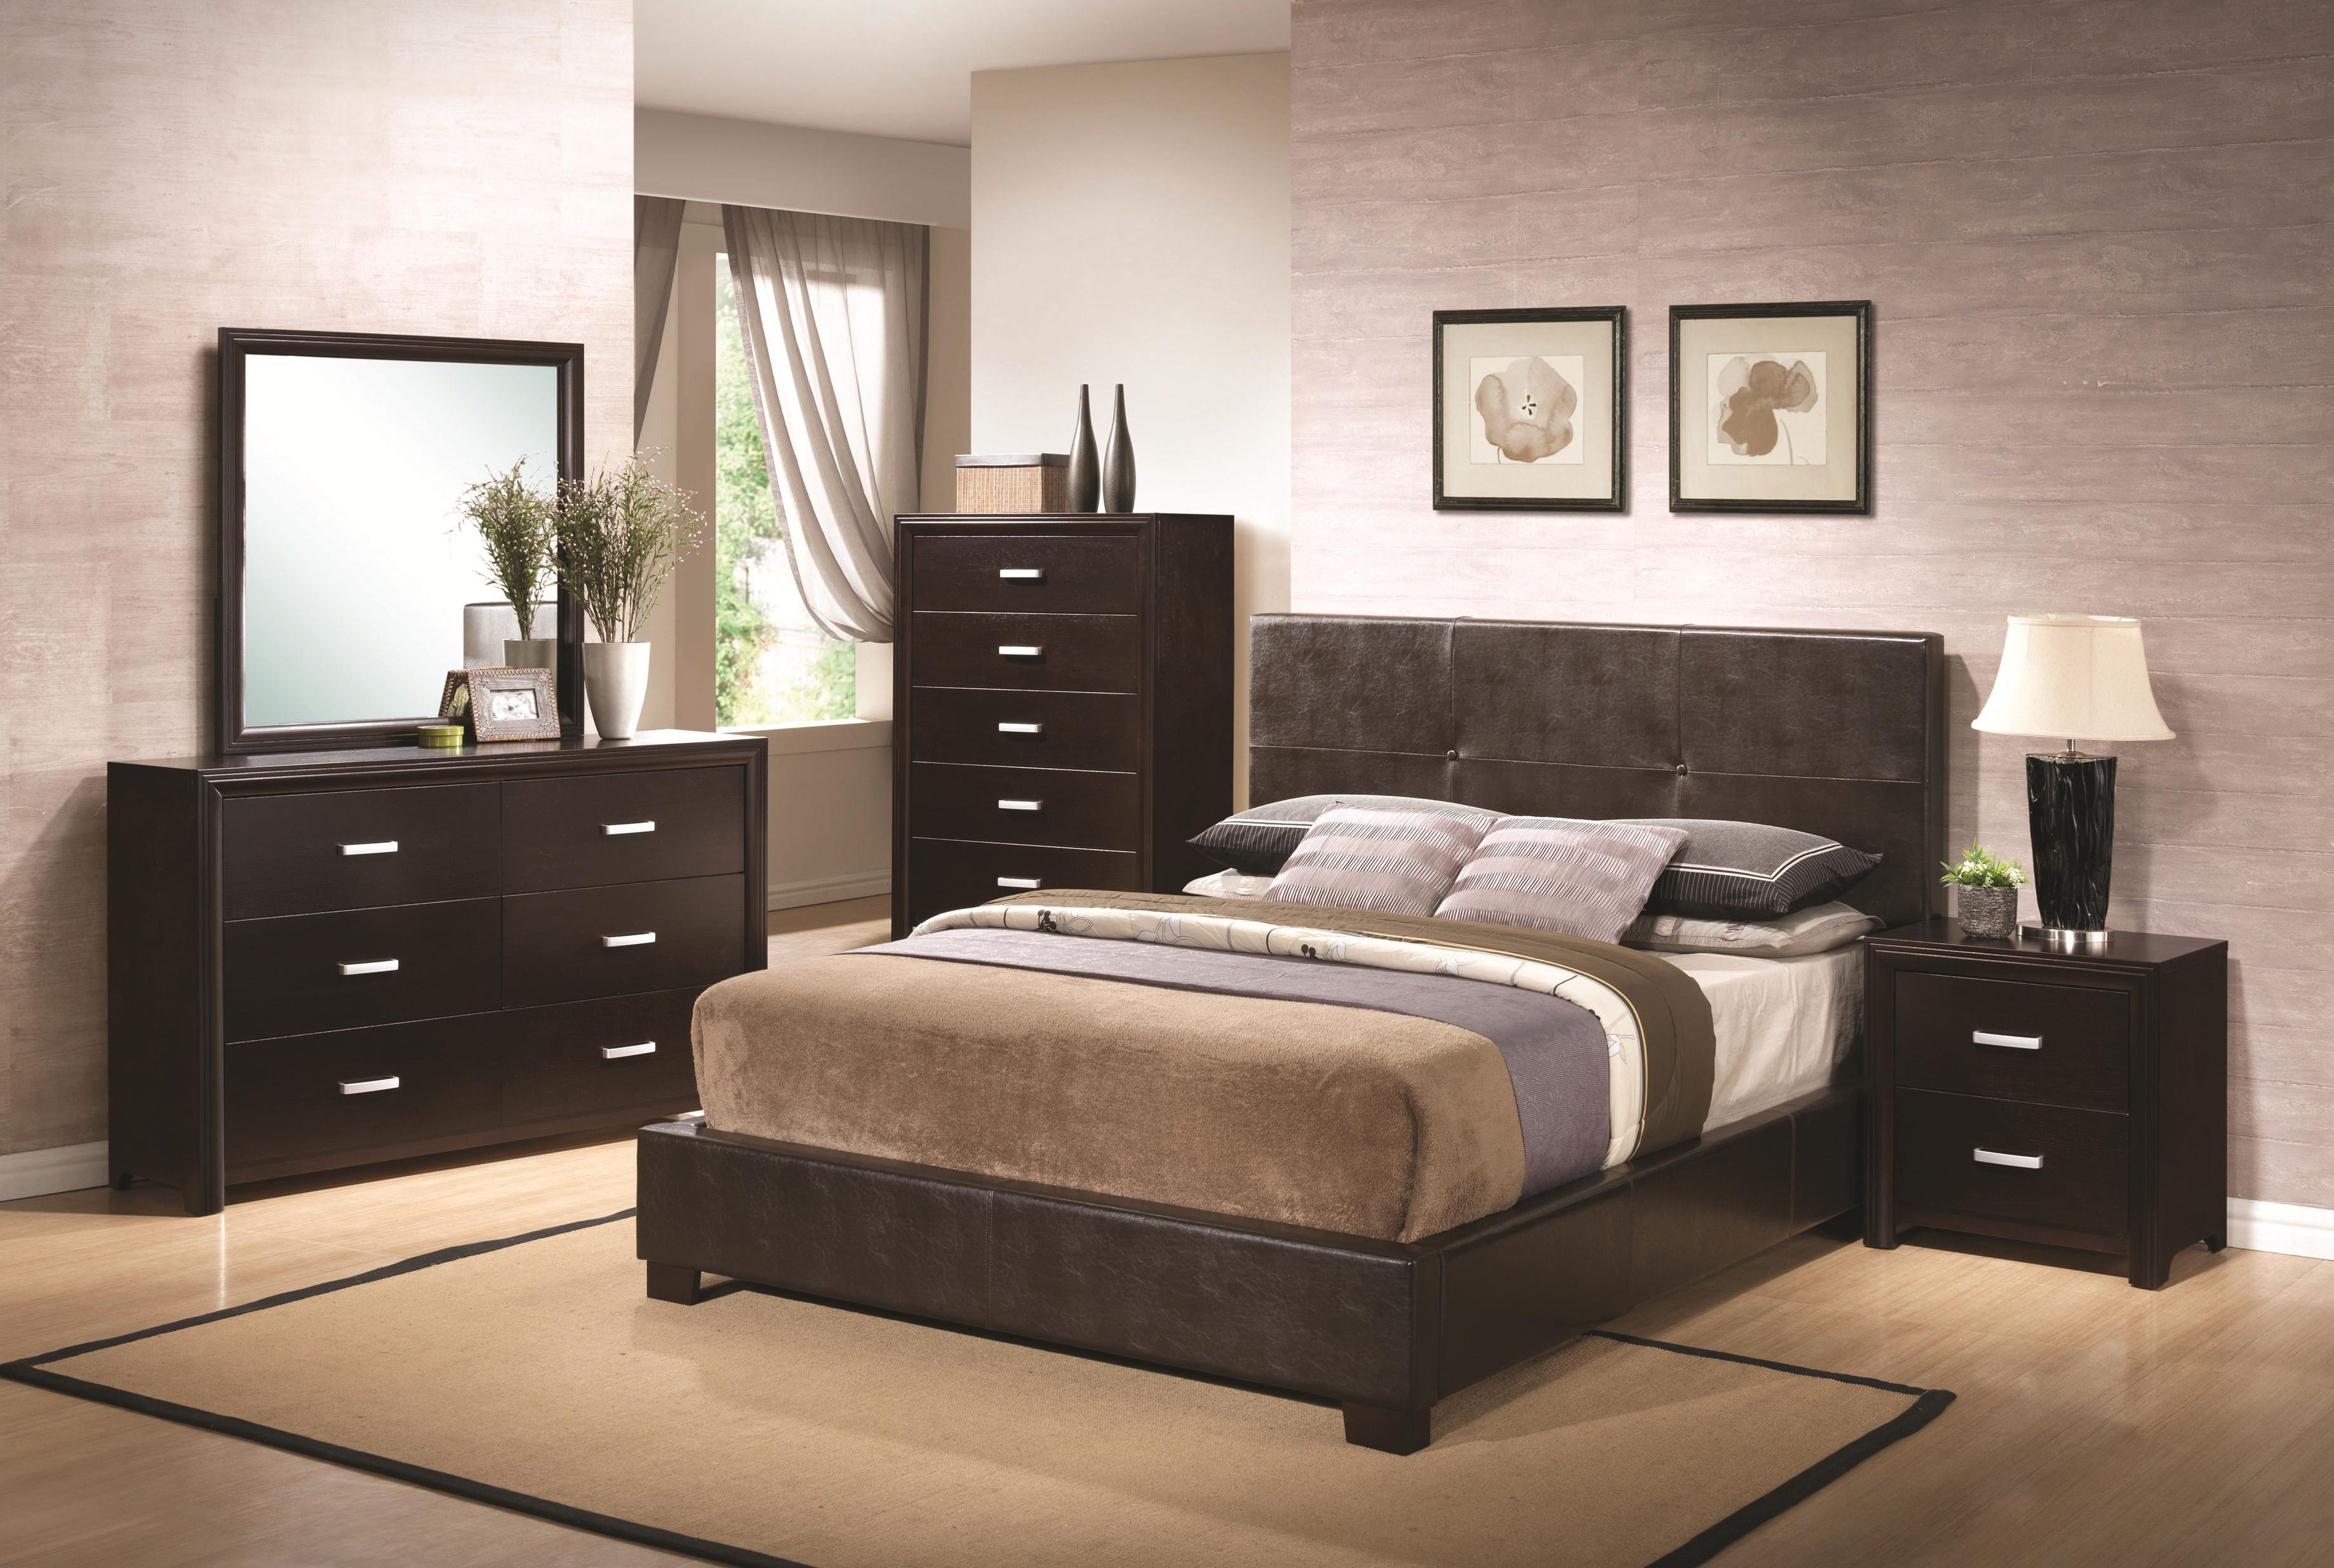 black bedroom furniture sets ikea  hawk haven